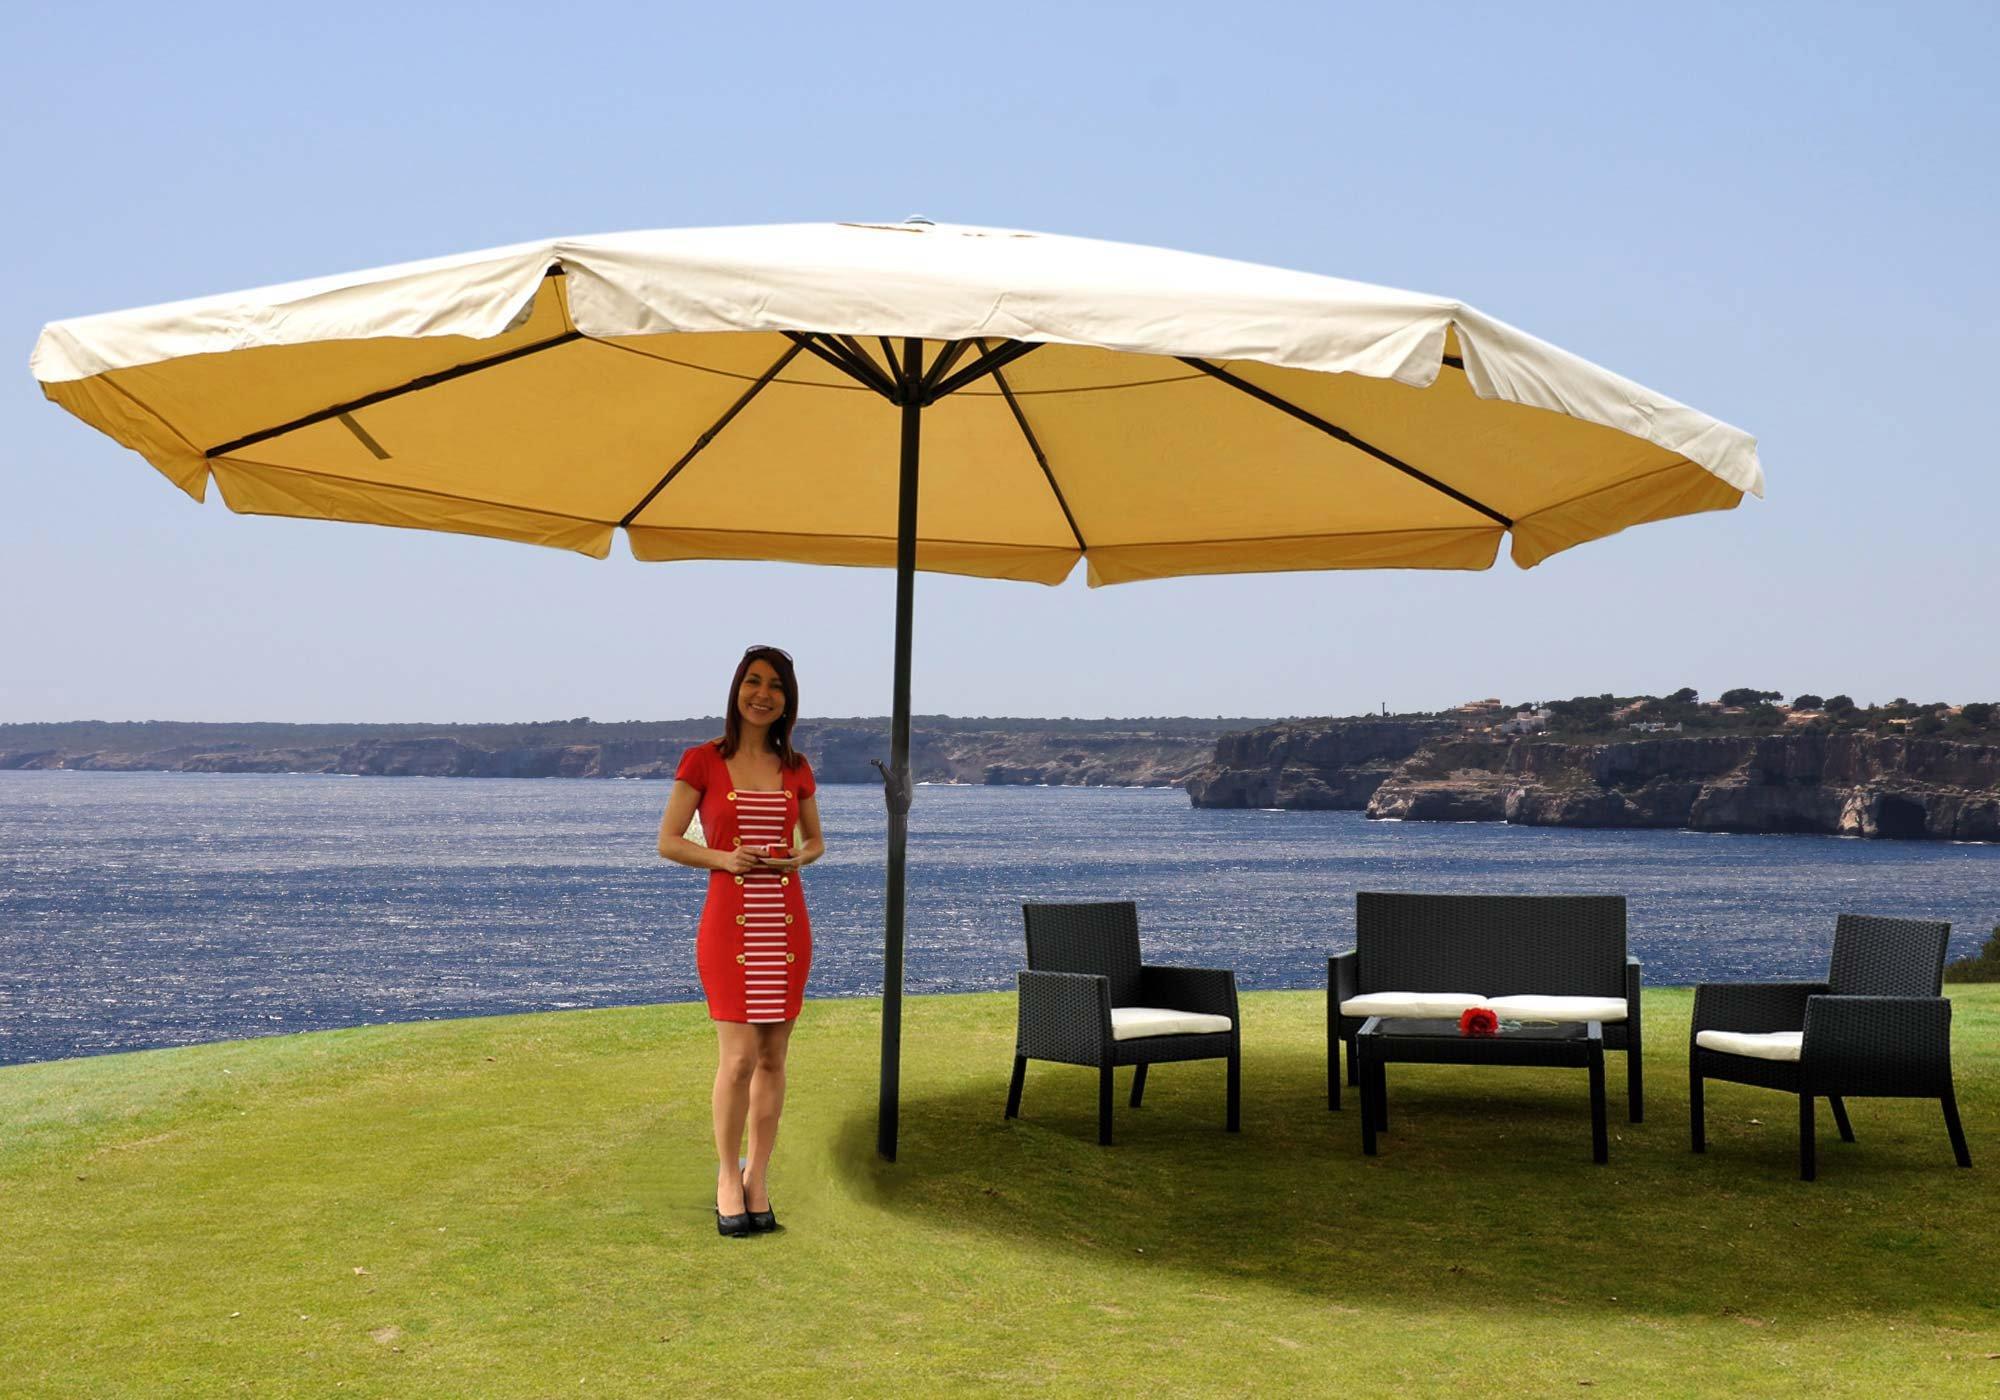 sombrilla misty color crema 5 m di metro base fija altura ajustable muy resistente. Black Bedroom Furniture Sets. Home Design Ideas